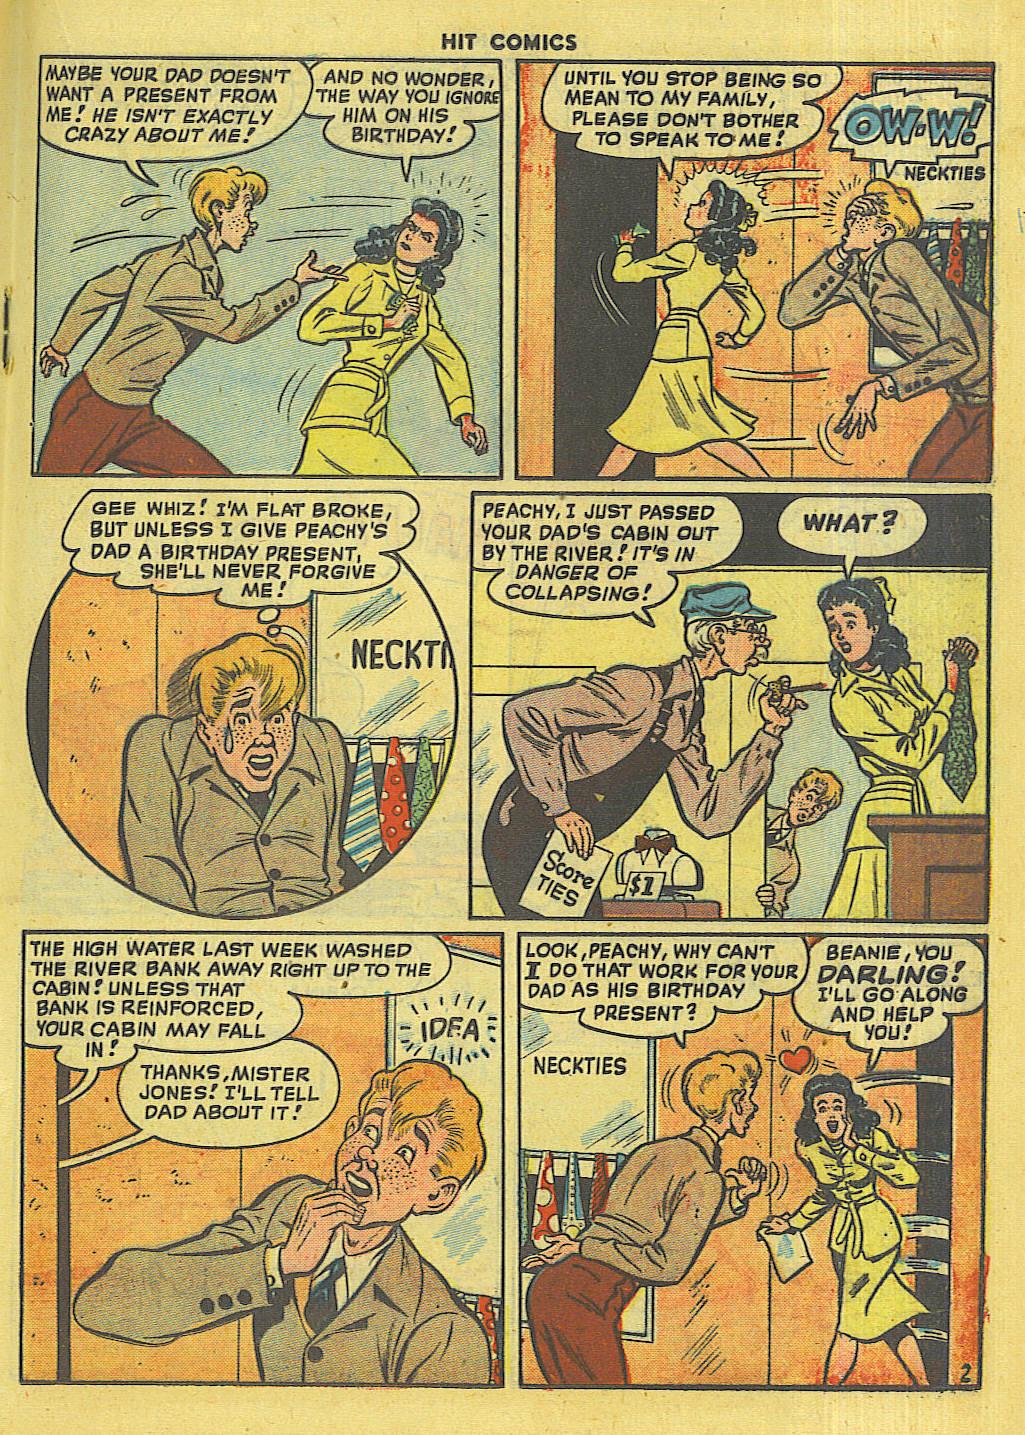 Read online Hit Comics comic -  Issue #56 - 27